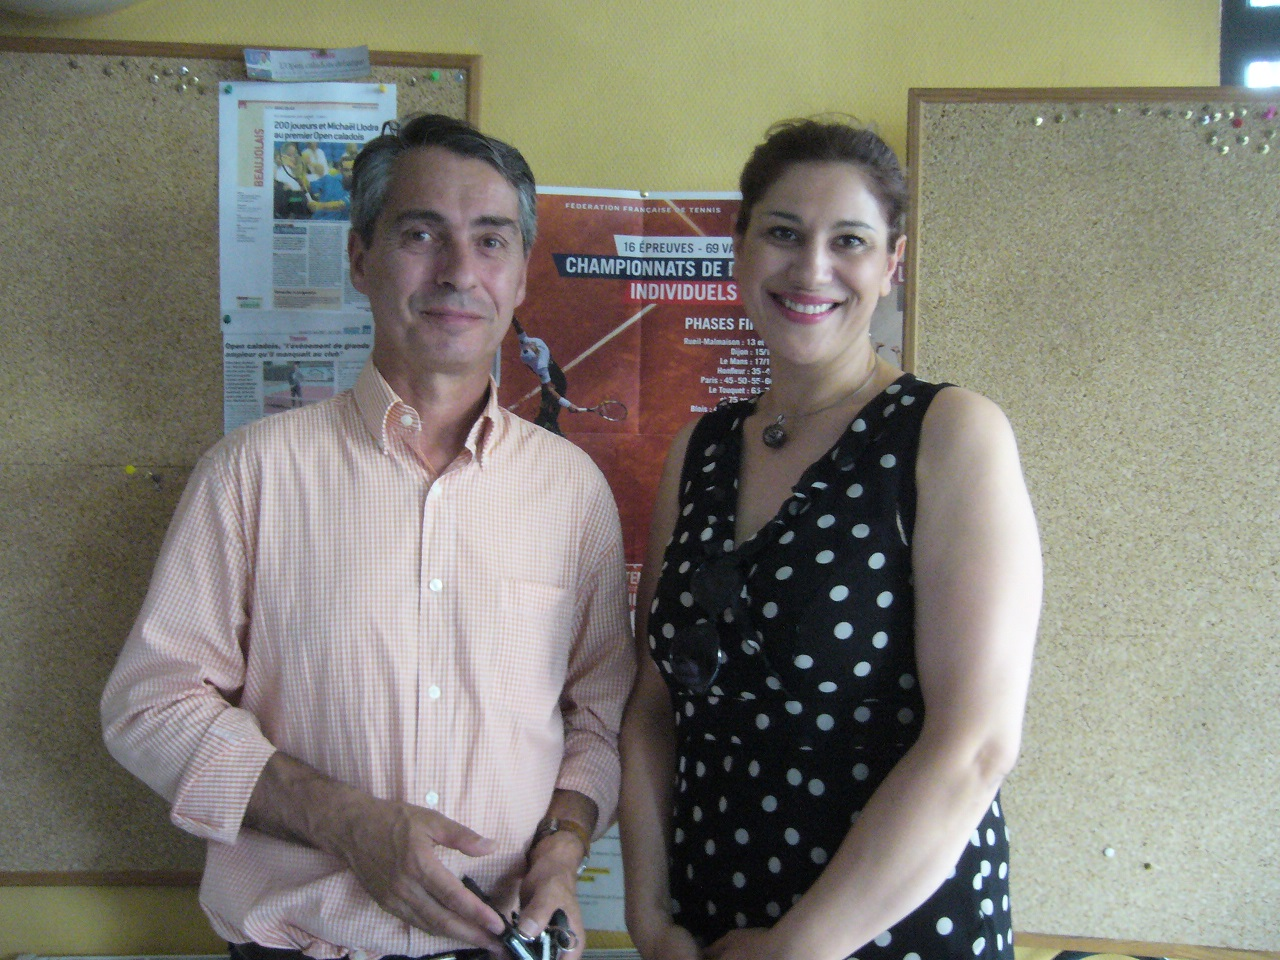 Le Docteur Bertrand Beaune et Nadjette Guidoum.jpg